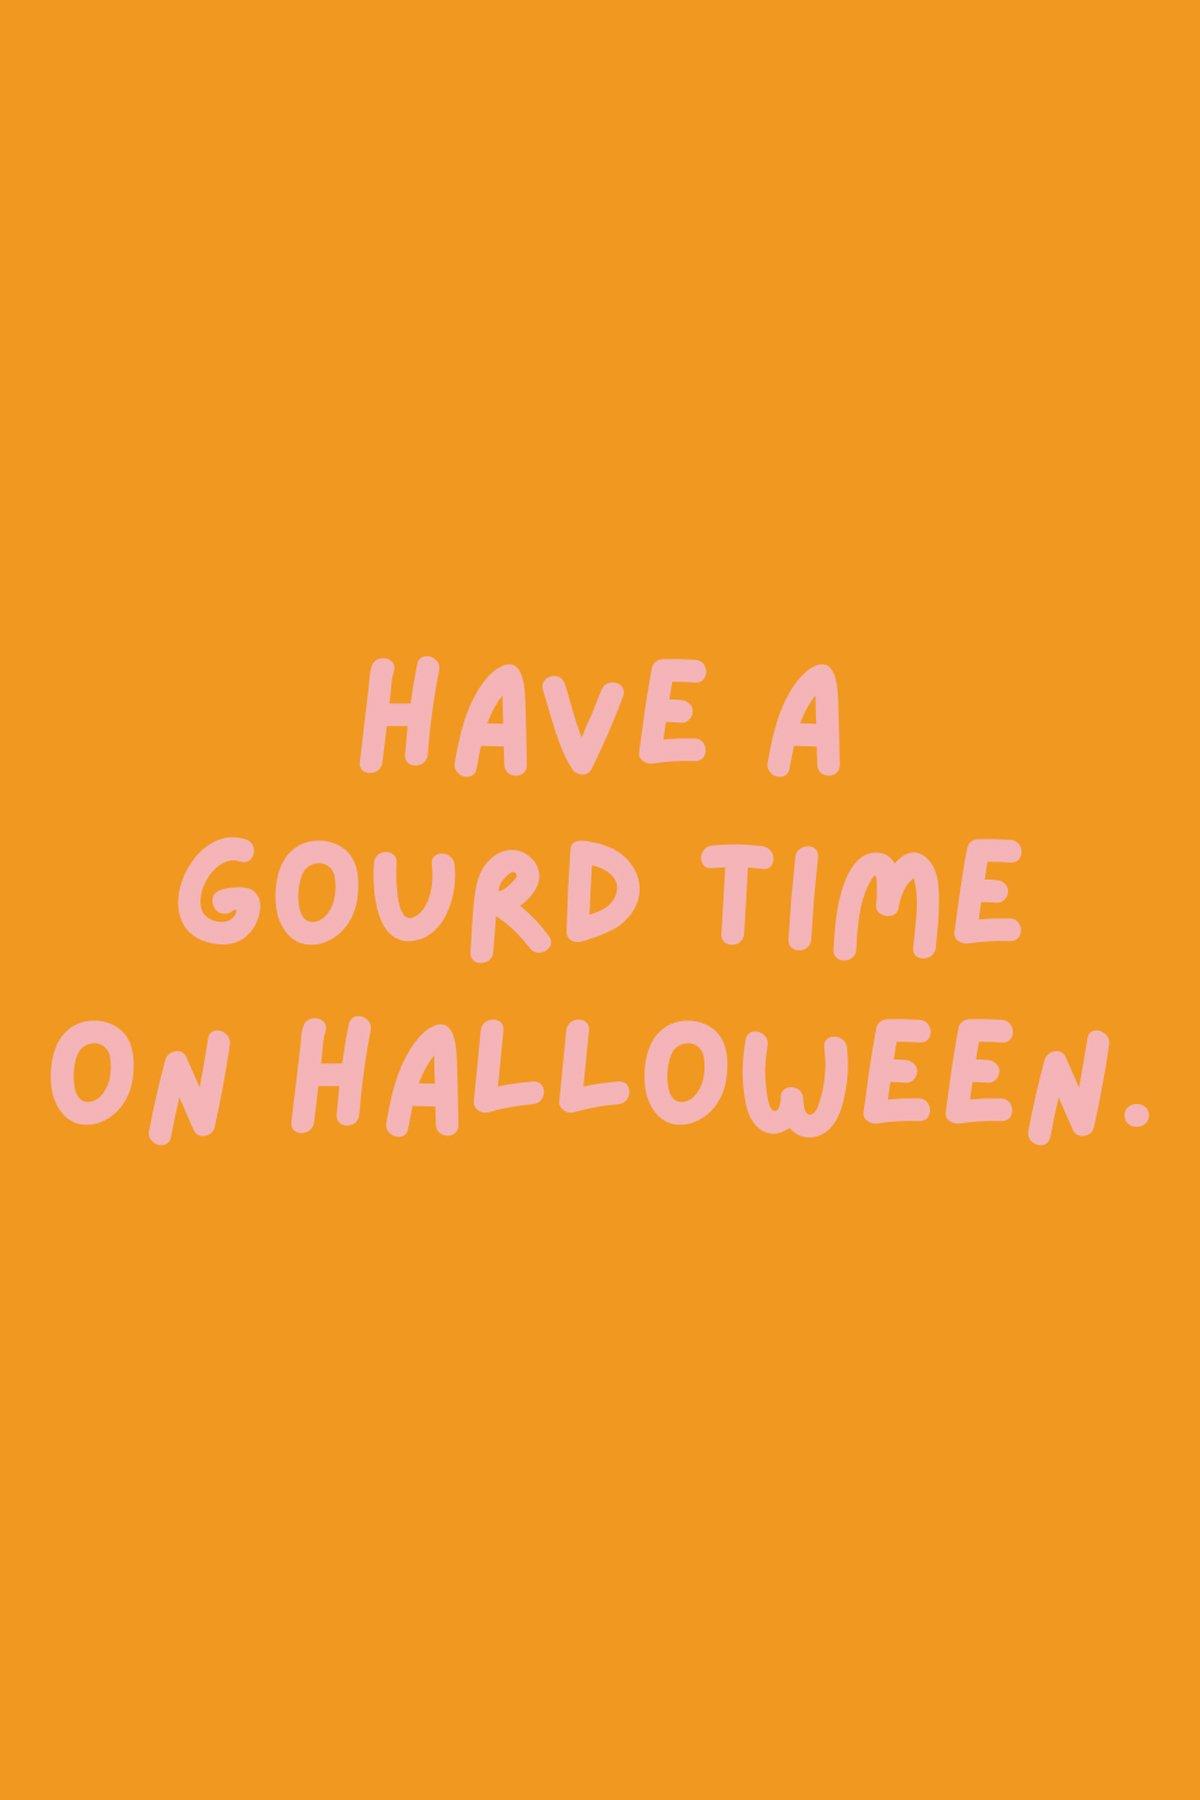 Halloween Sayings gourd